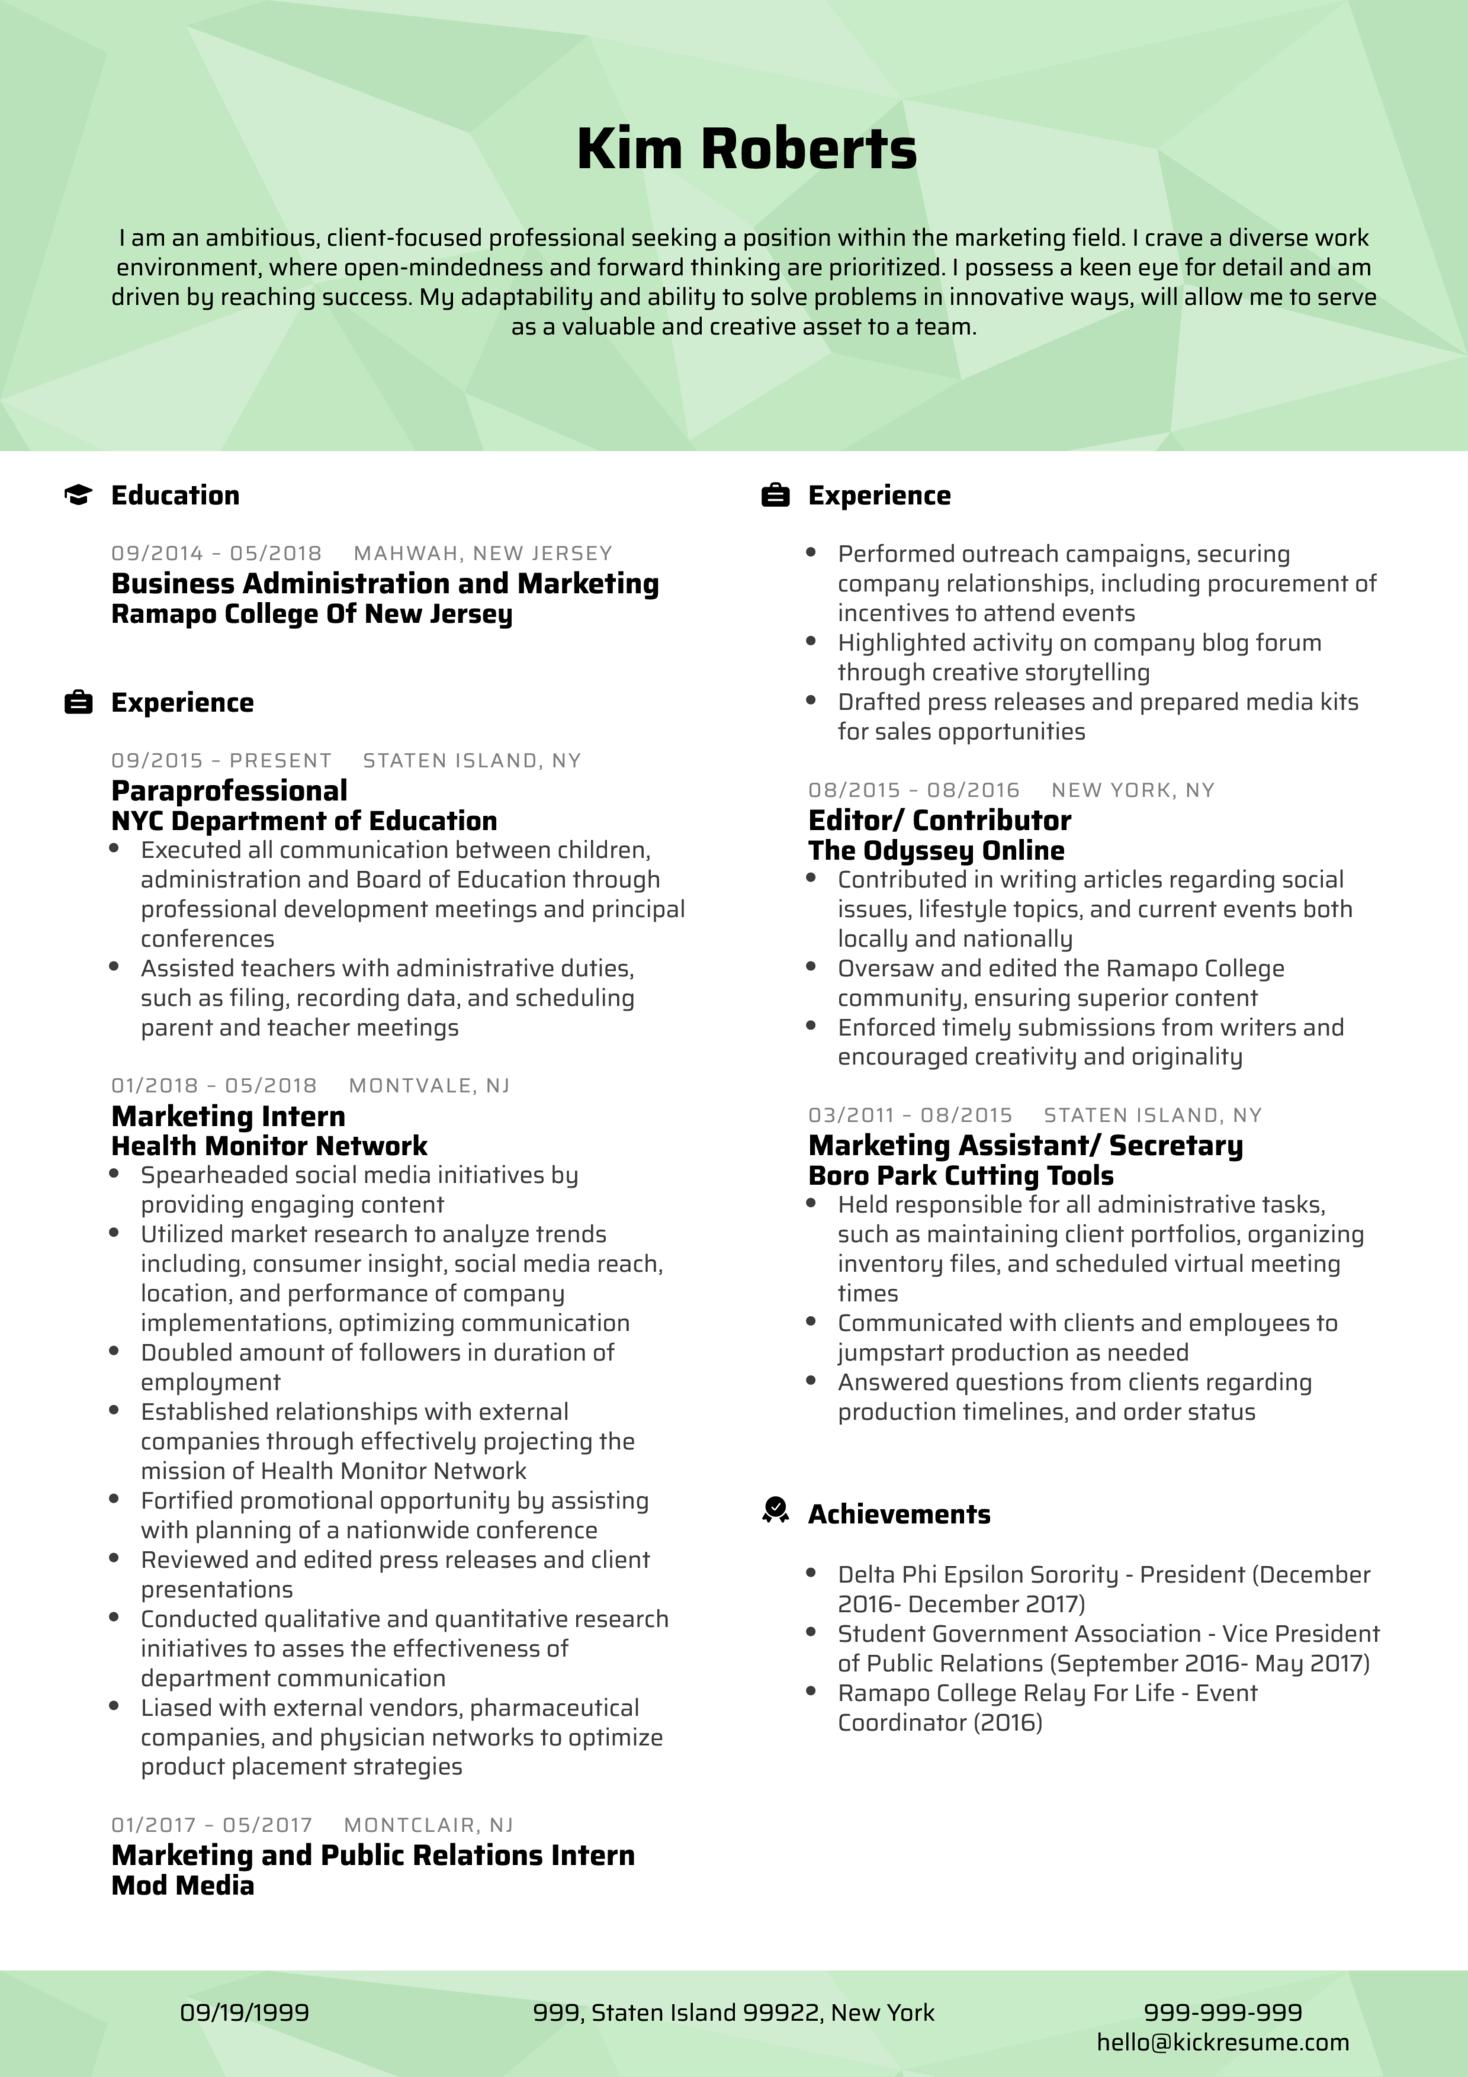 Professional Project Coordinator CV Sample (Teil 1)